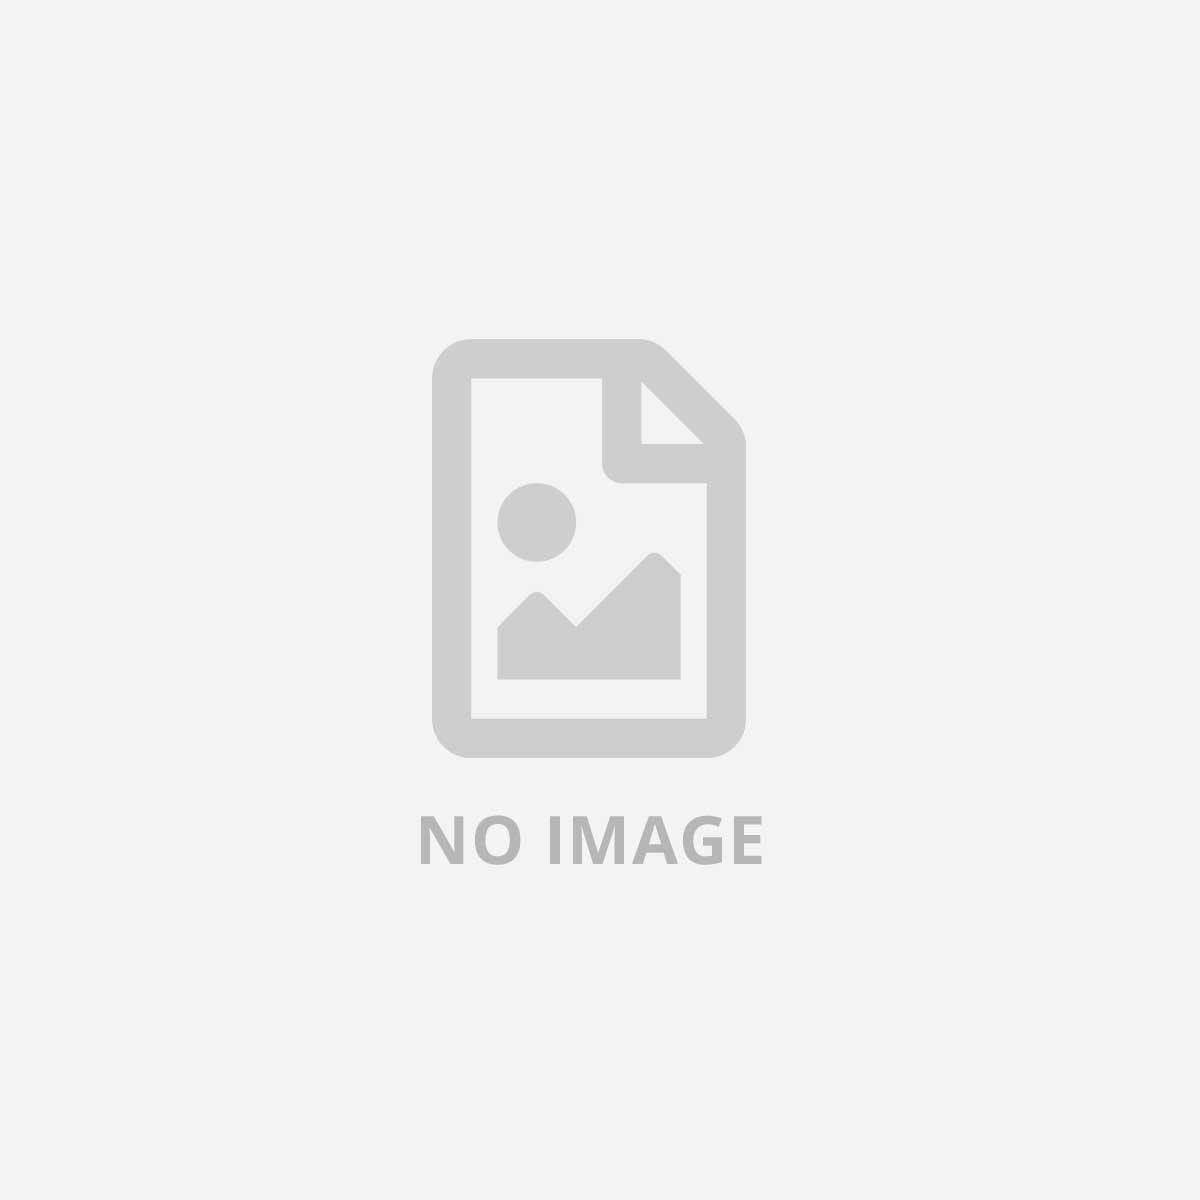 WATCHGUARD PANDA ADAPTIVE DEFENSE SIEMFEEDE